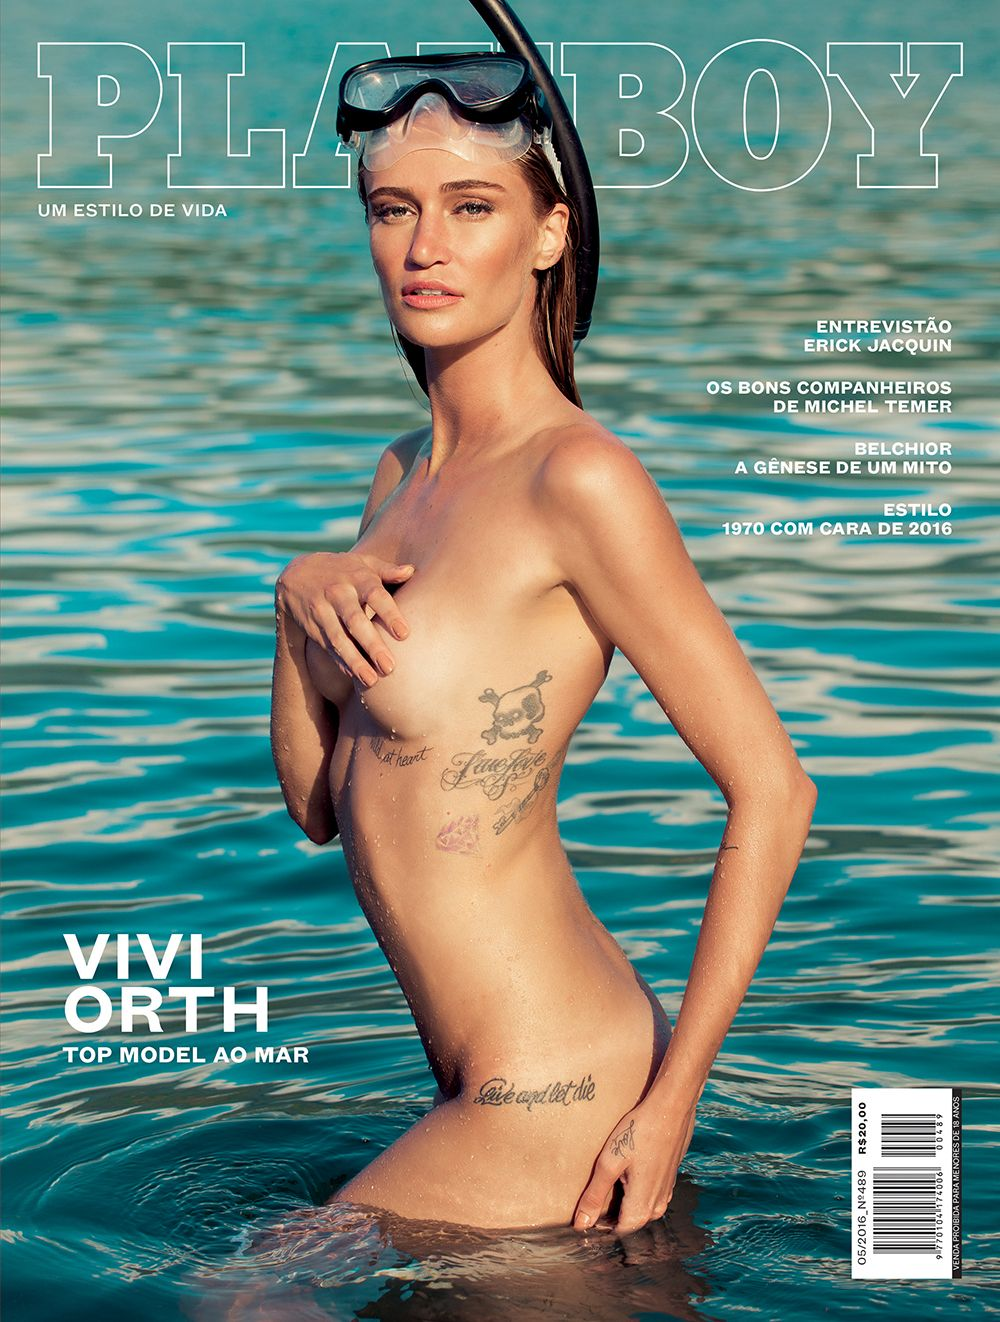 Vivi Orth Nua na Revista Playboy Maio 2016